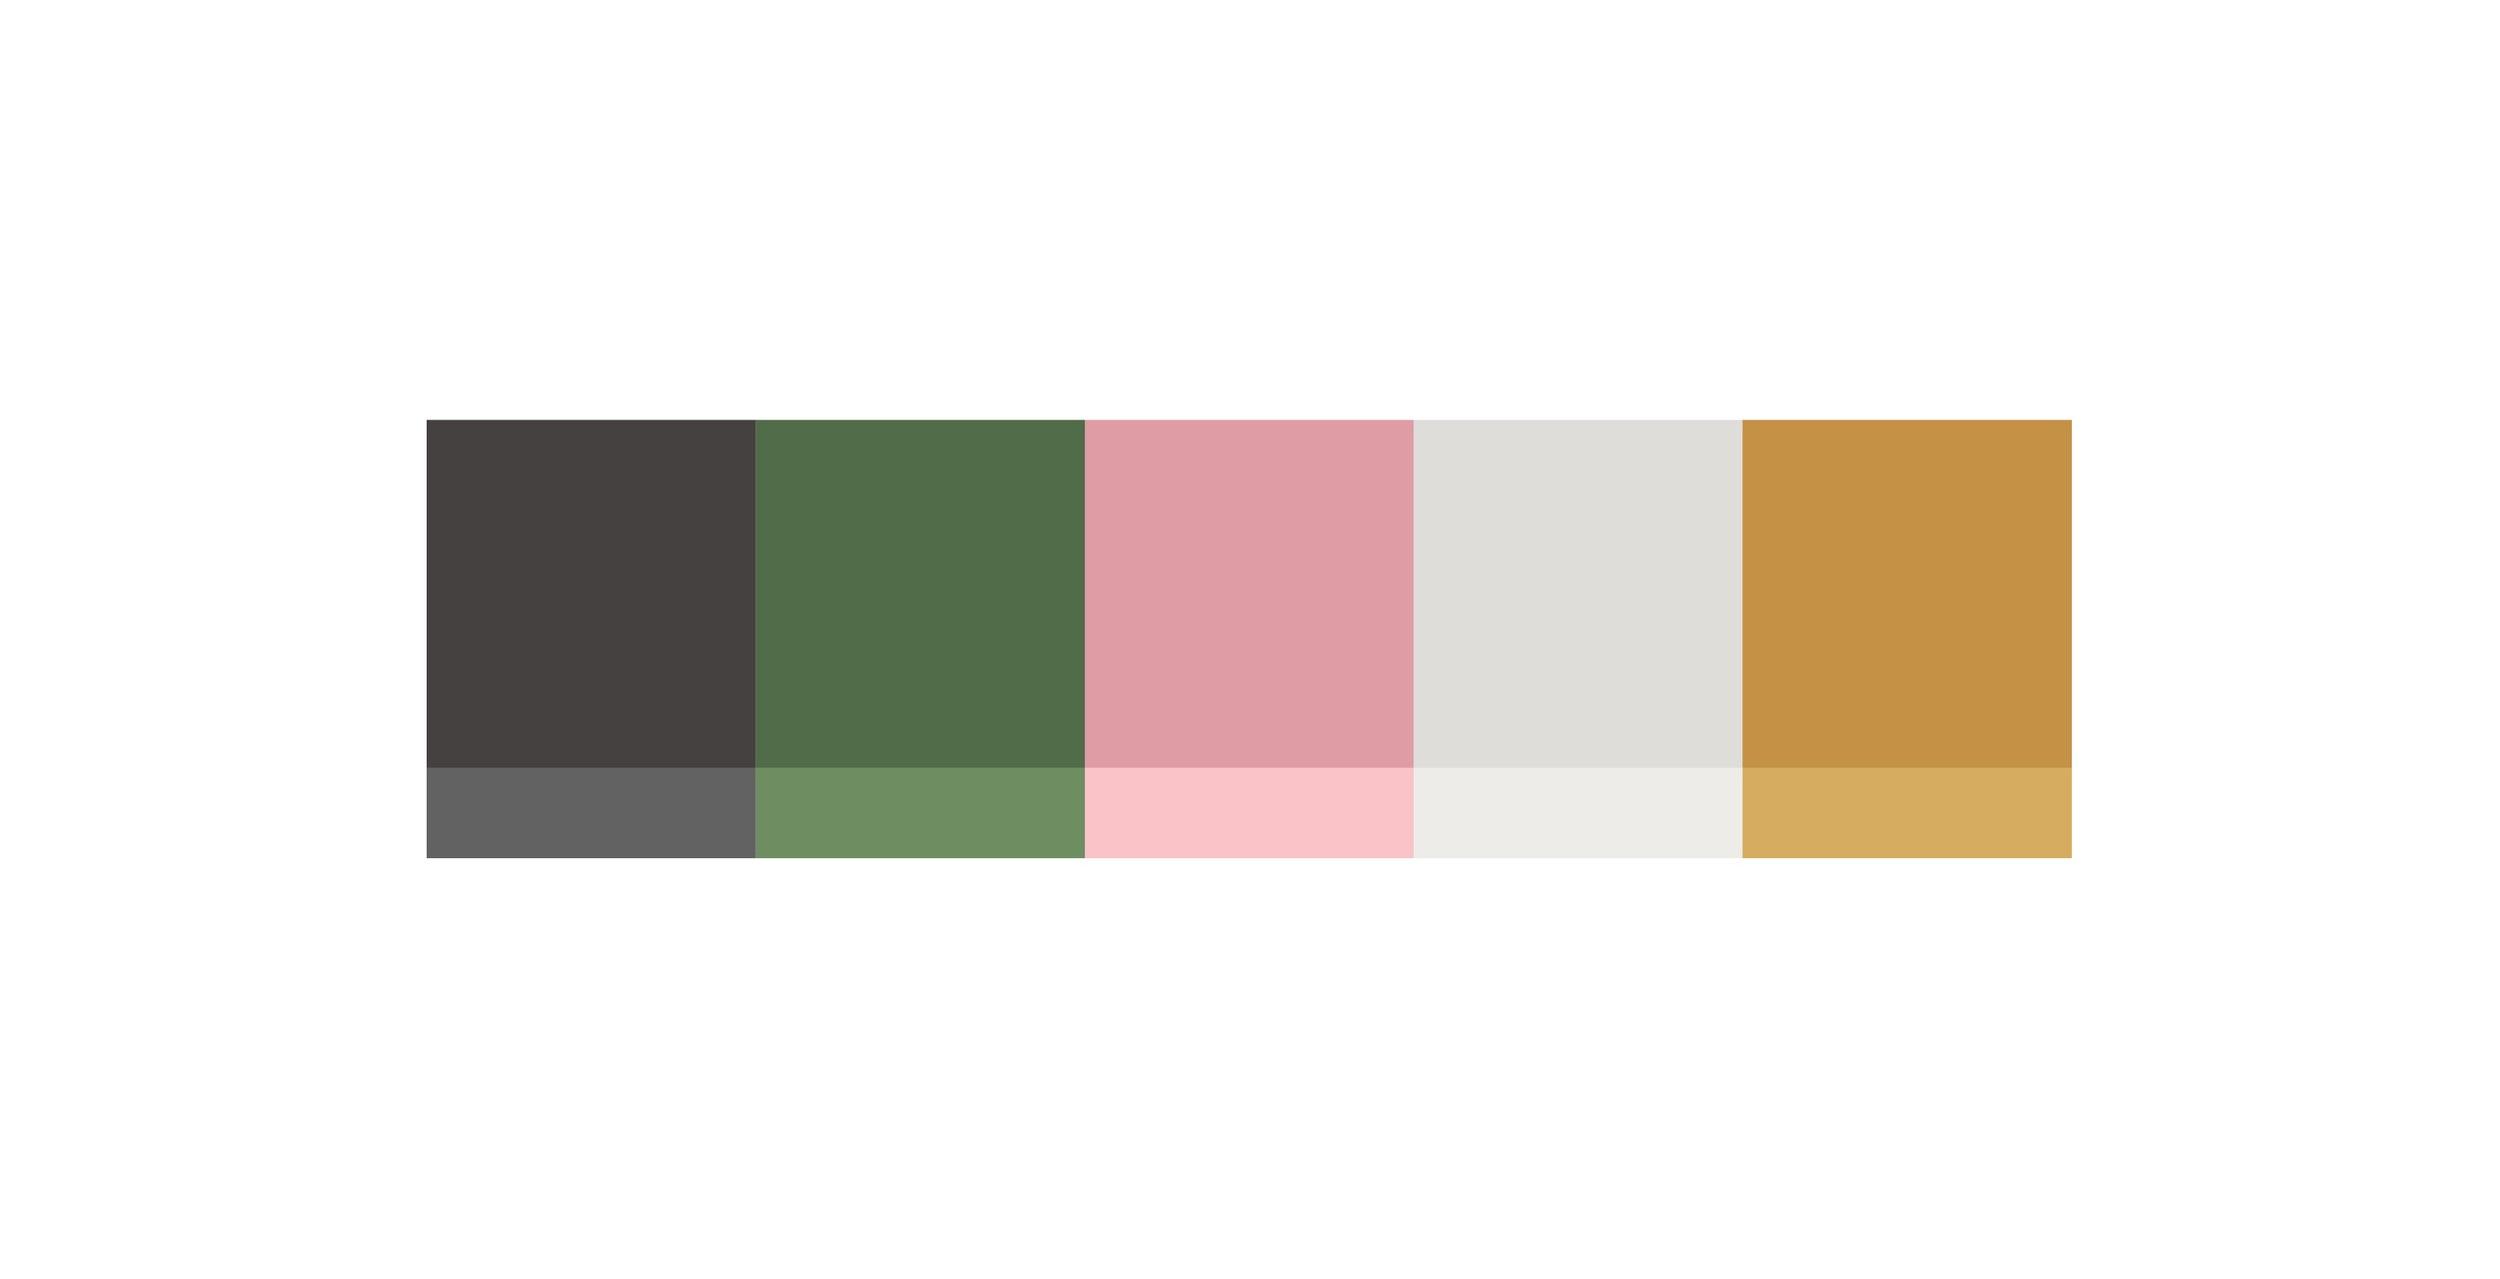 LynseyCreative_RootandRestore_Portfolio_colorpalette.jpg